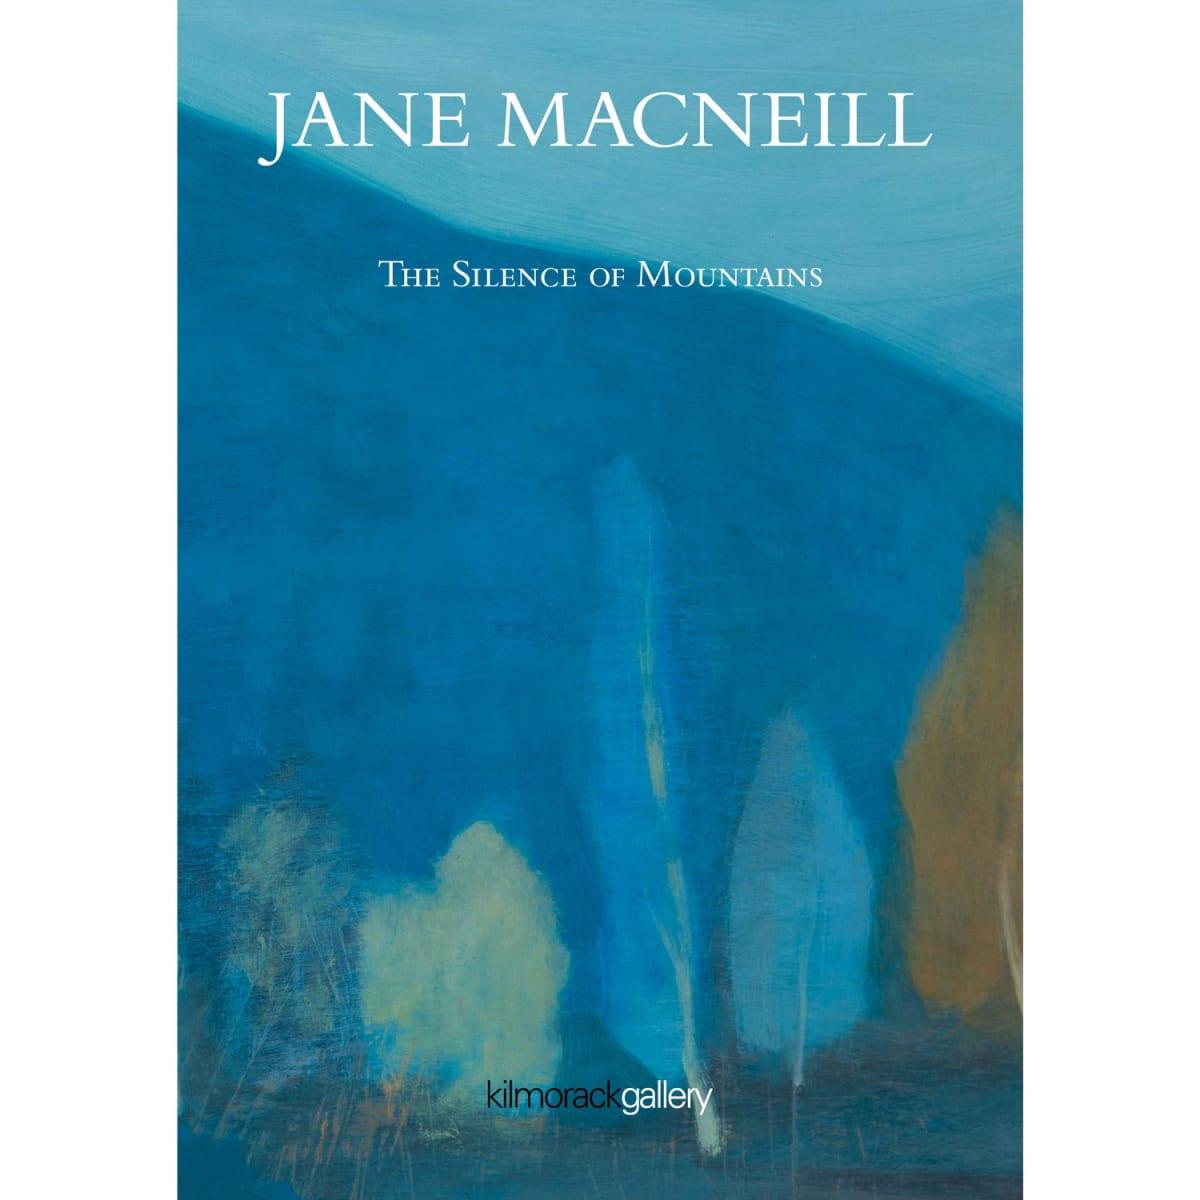 JANE MACNEILL